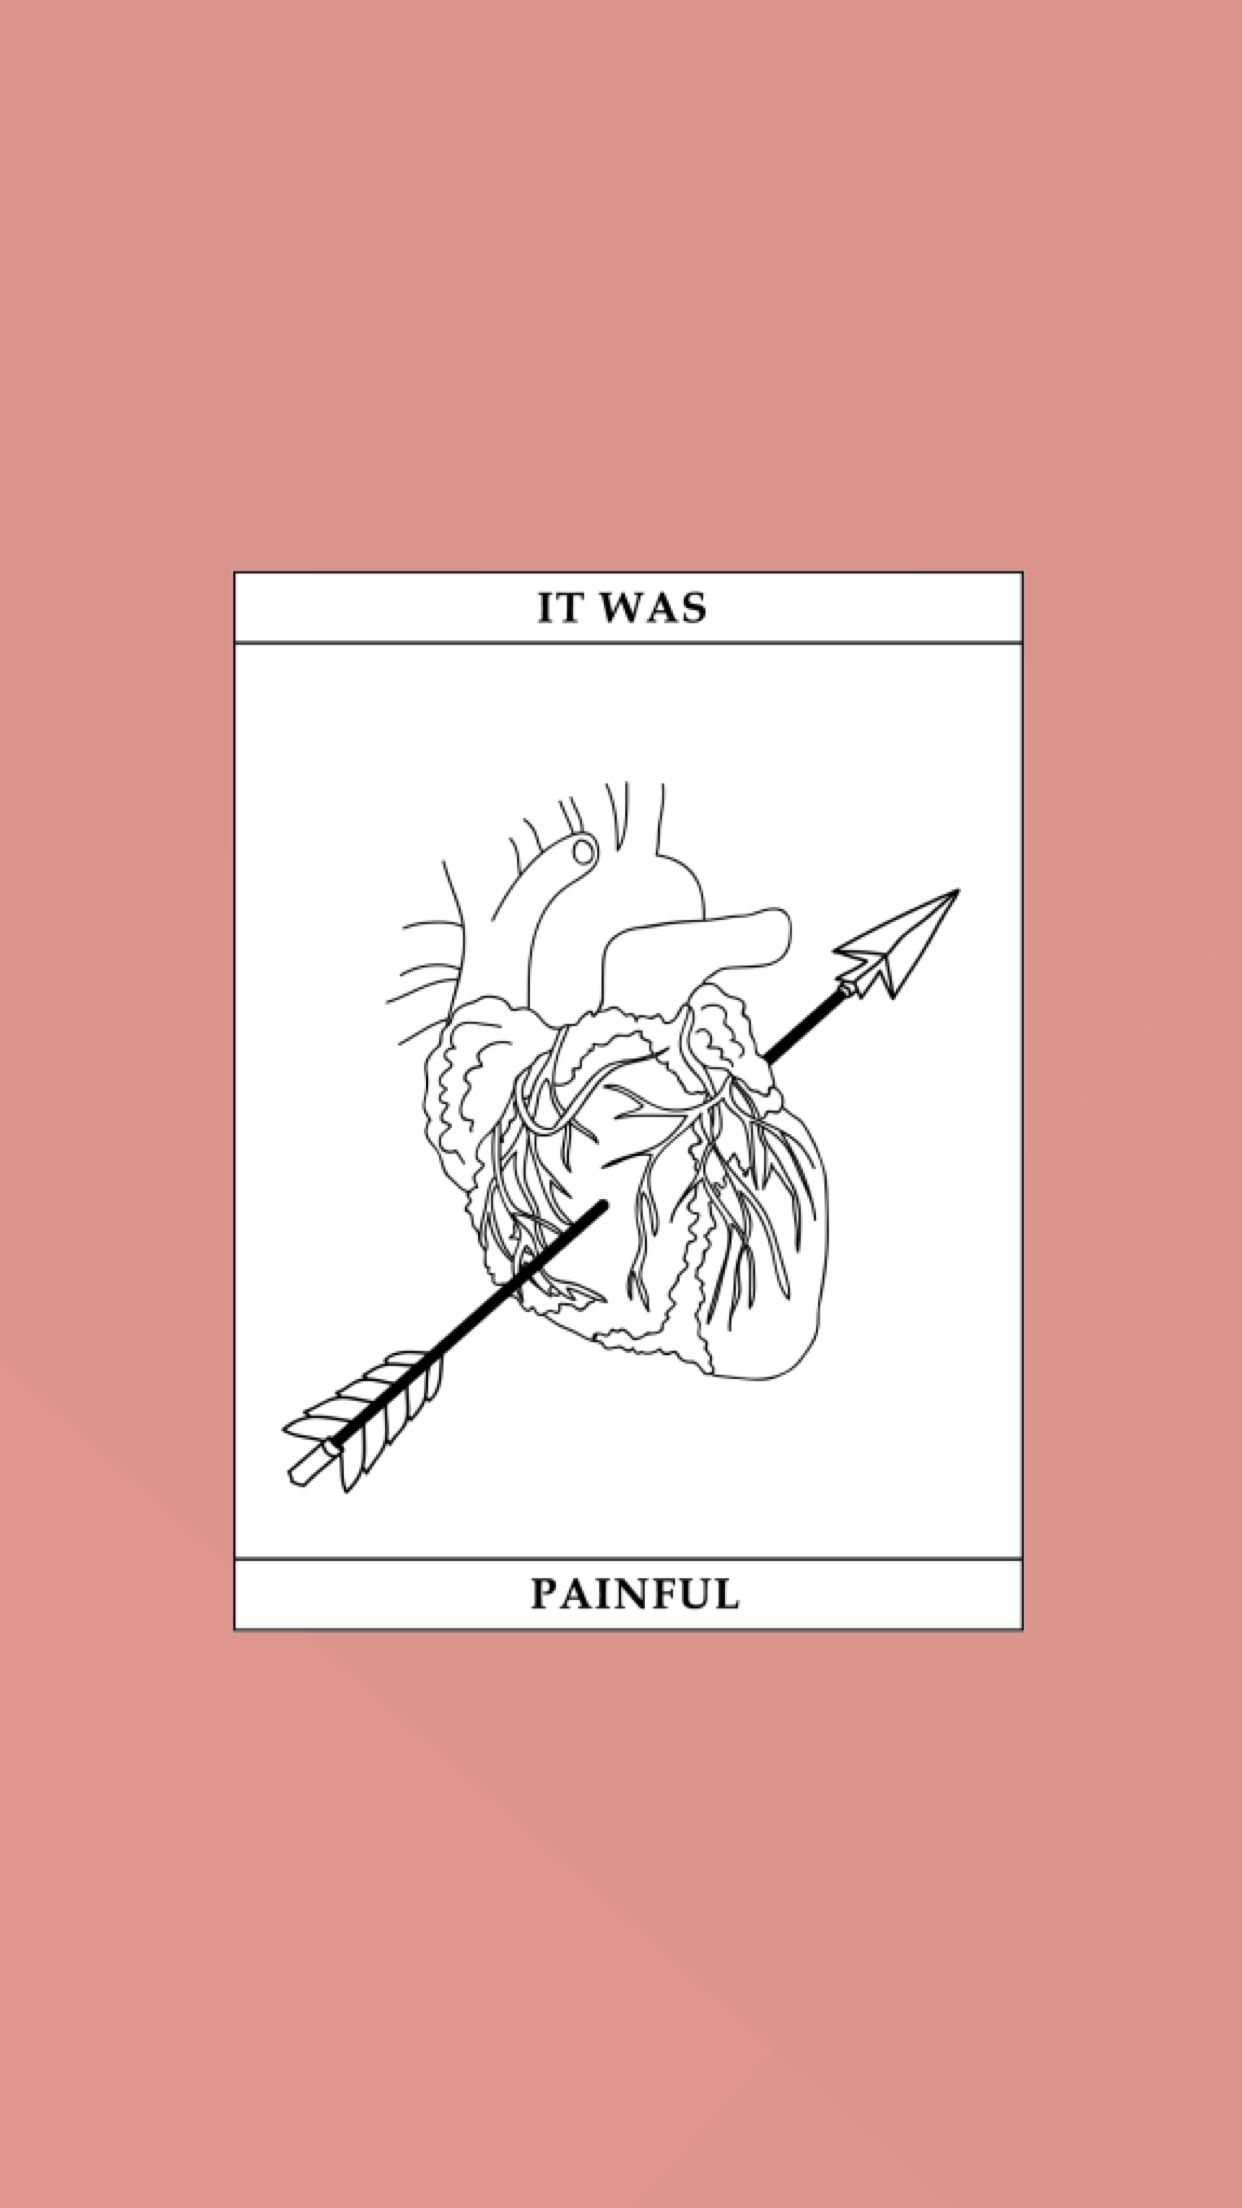 Painful wallpaper made by Laurette instagramlaurette evonen 1242x2208